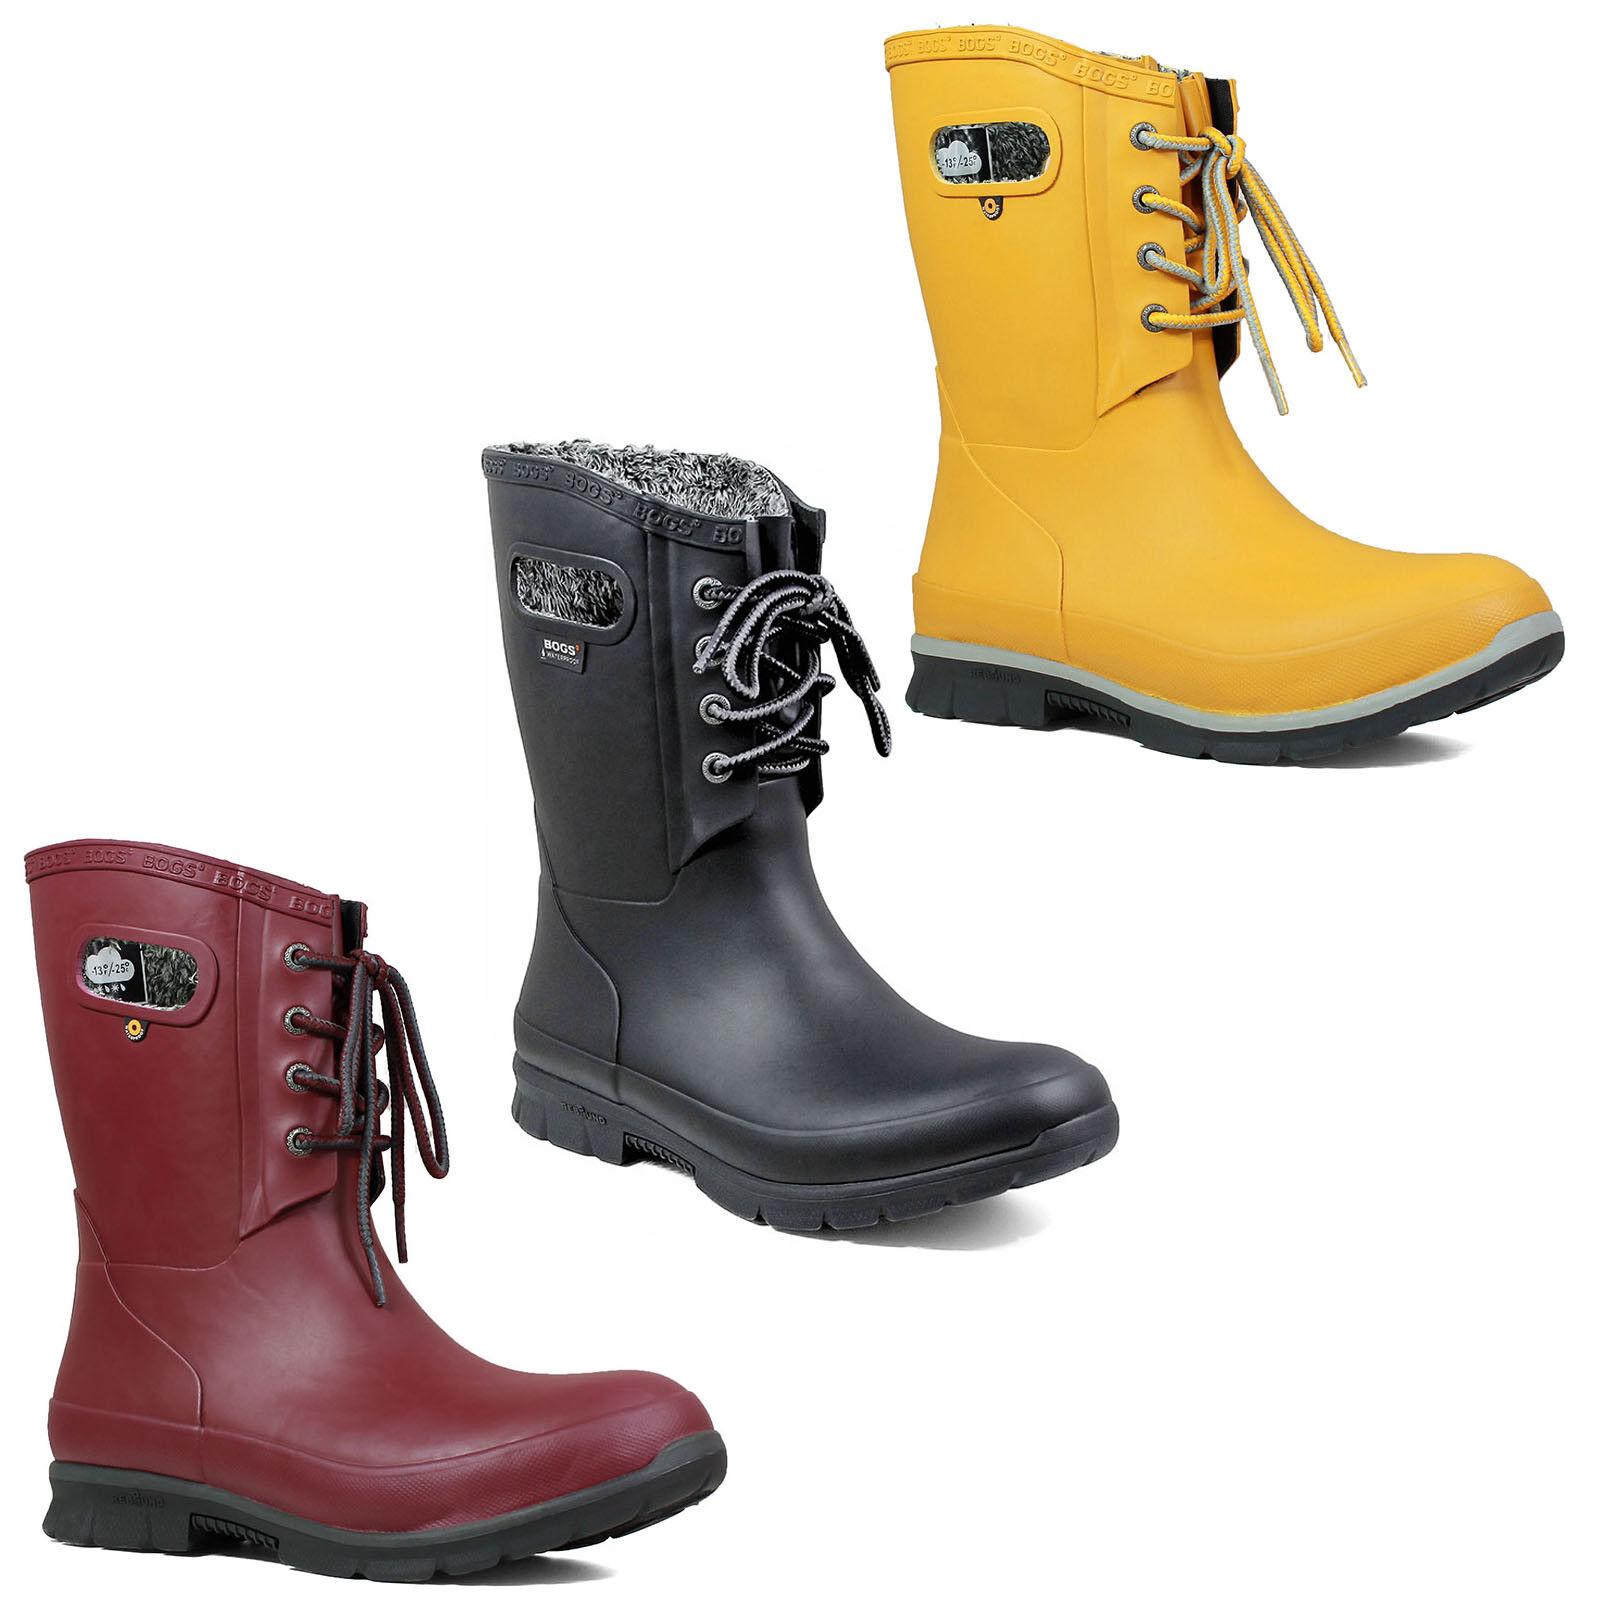 Bogs Plush Lined Wellington Boots 72103 Womens Amanda Laced Insulated Fashion